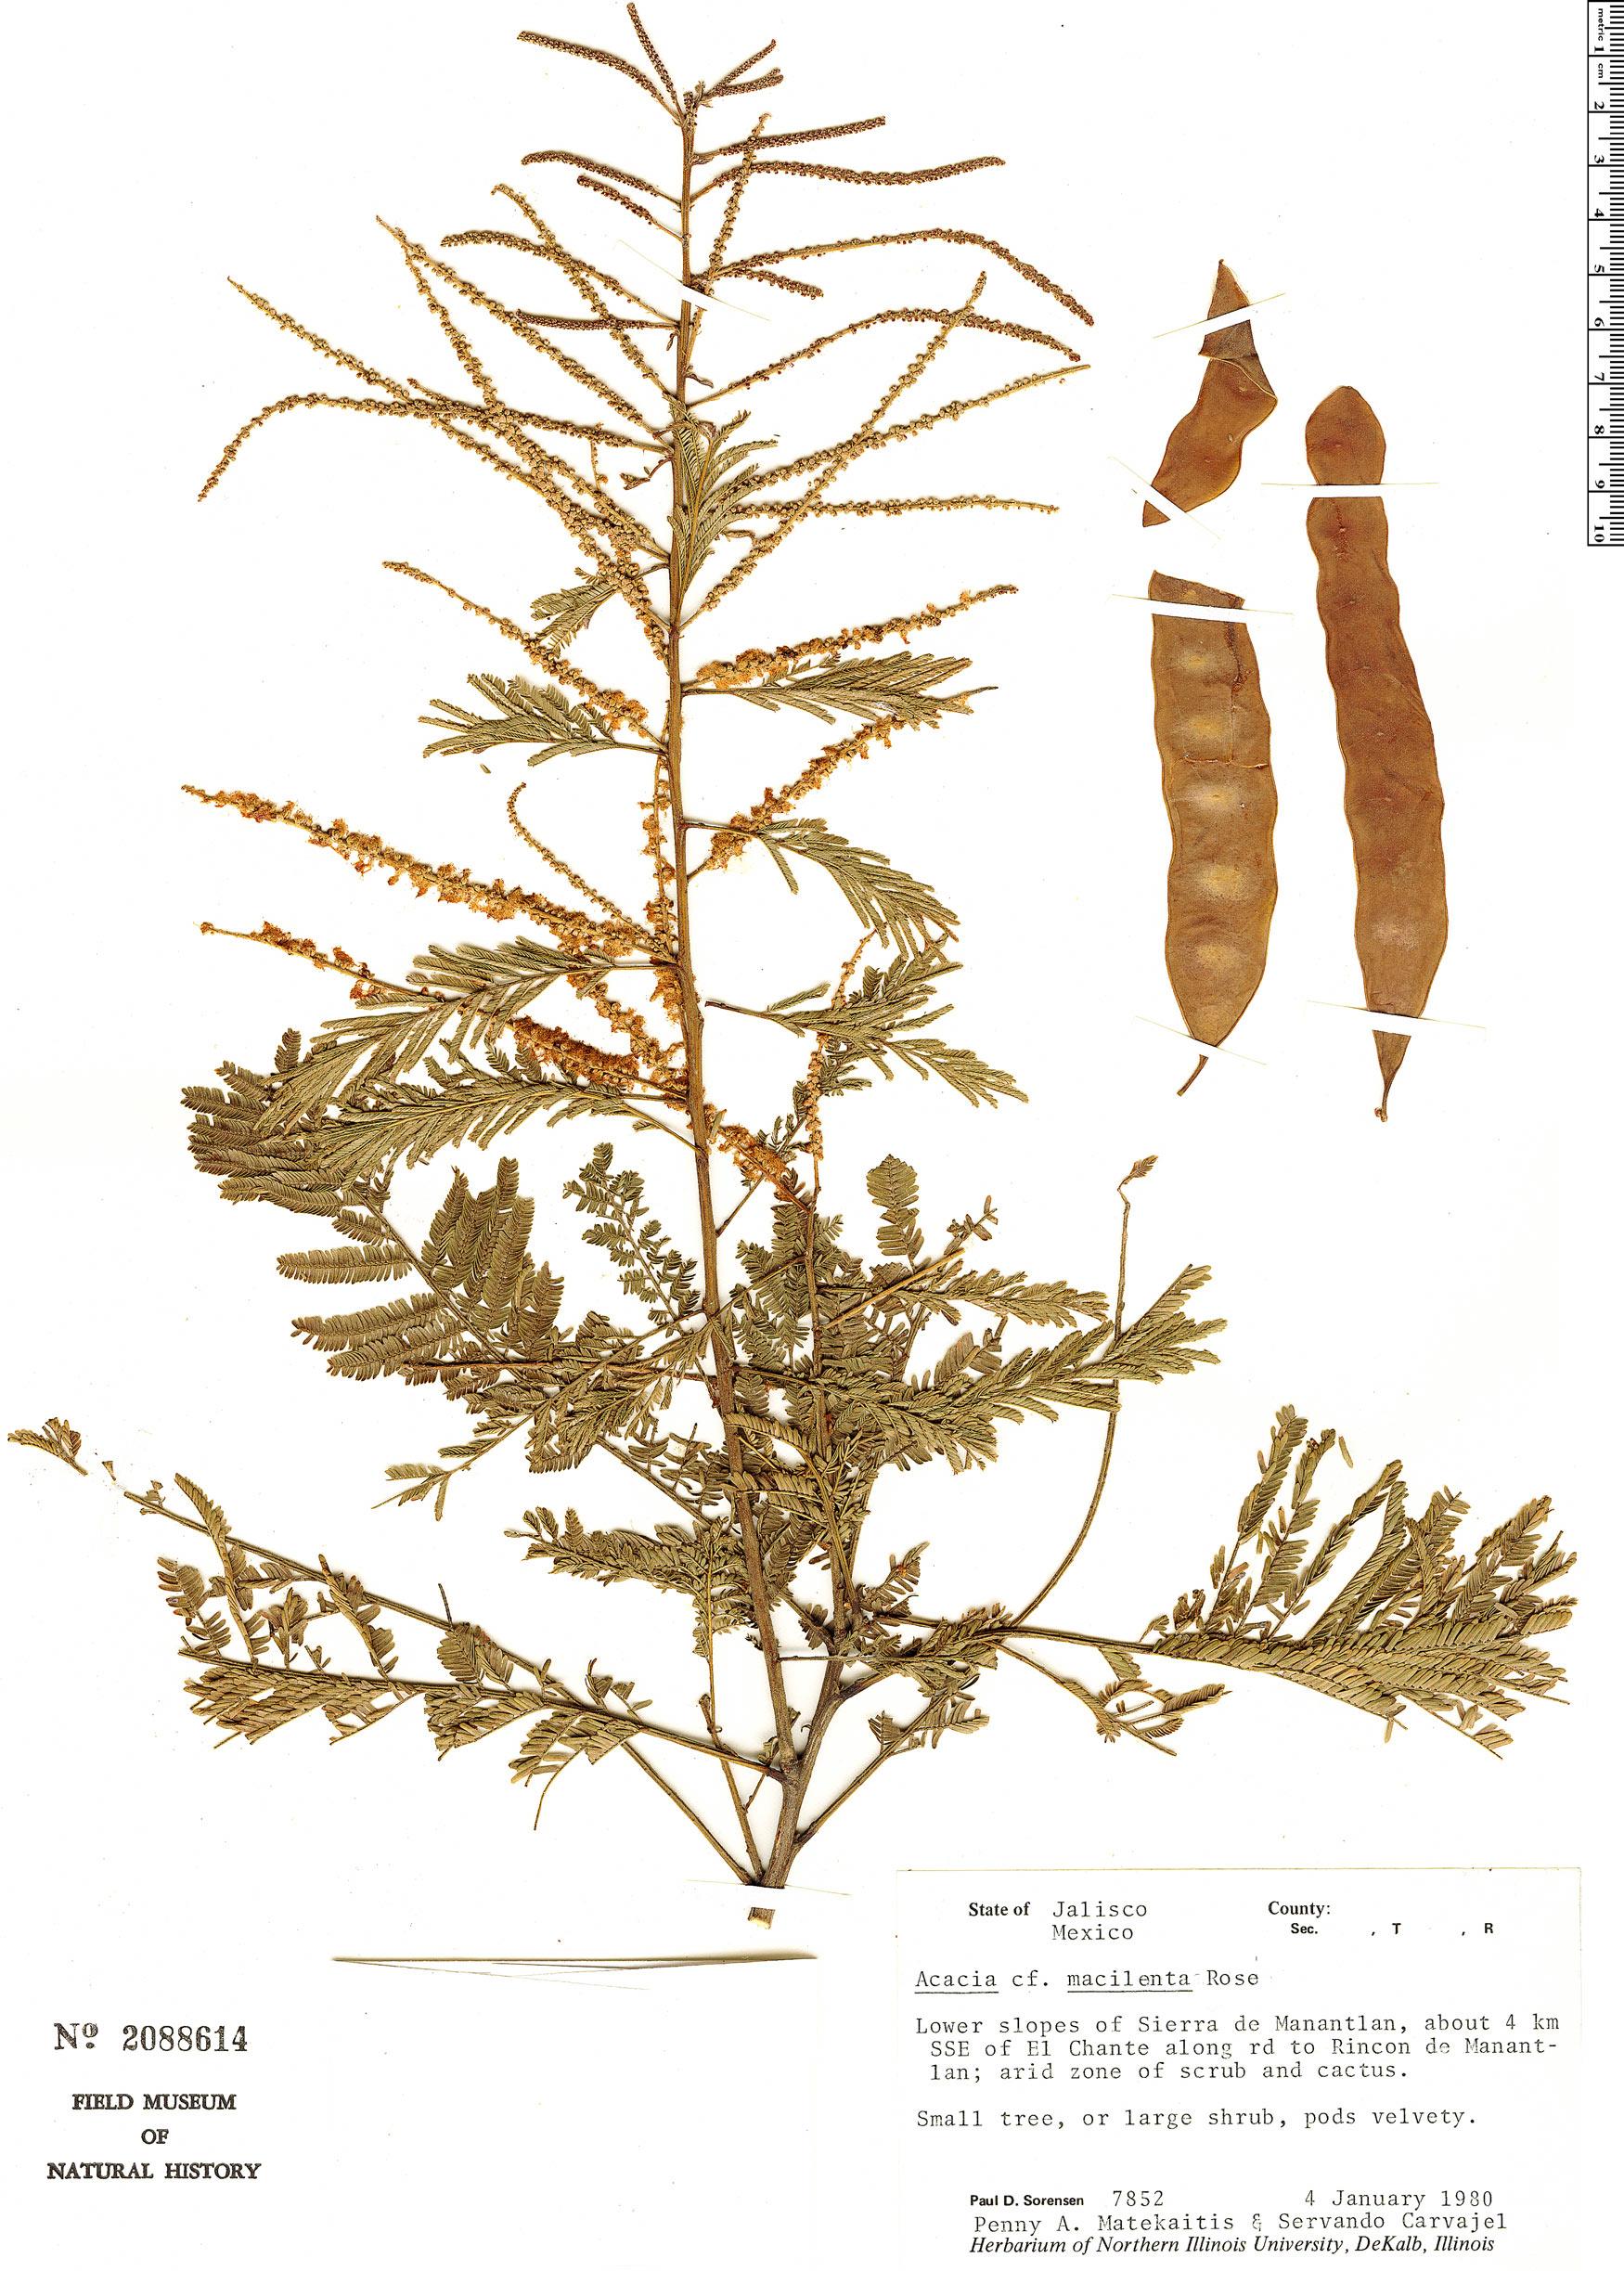 Specimen: Senegalia macilenta